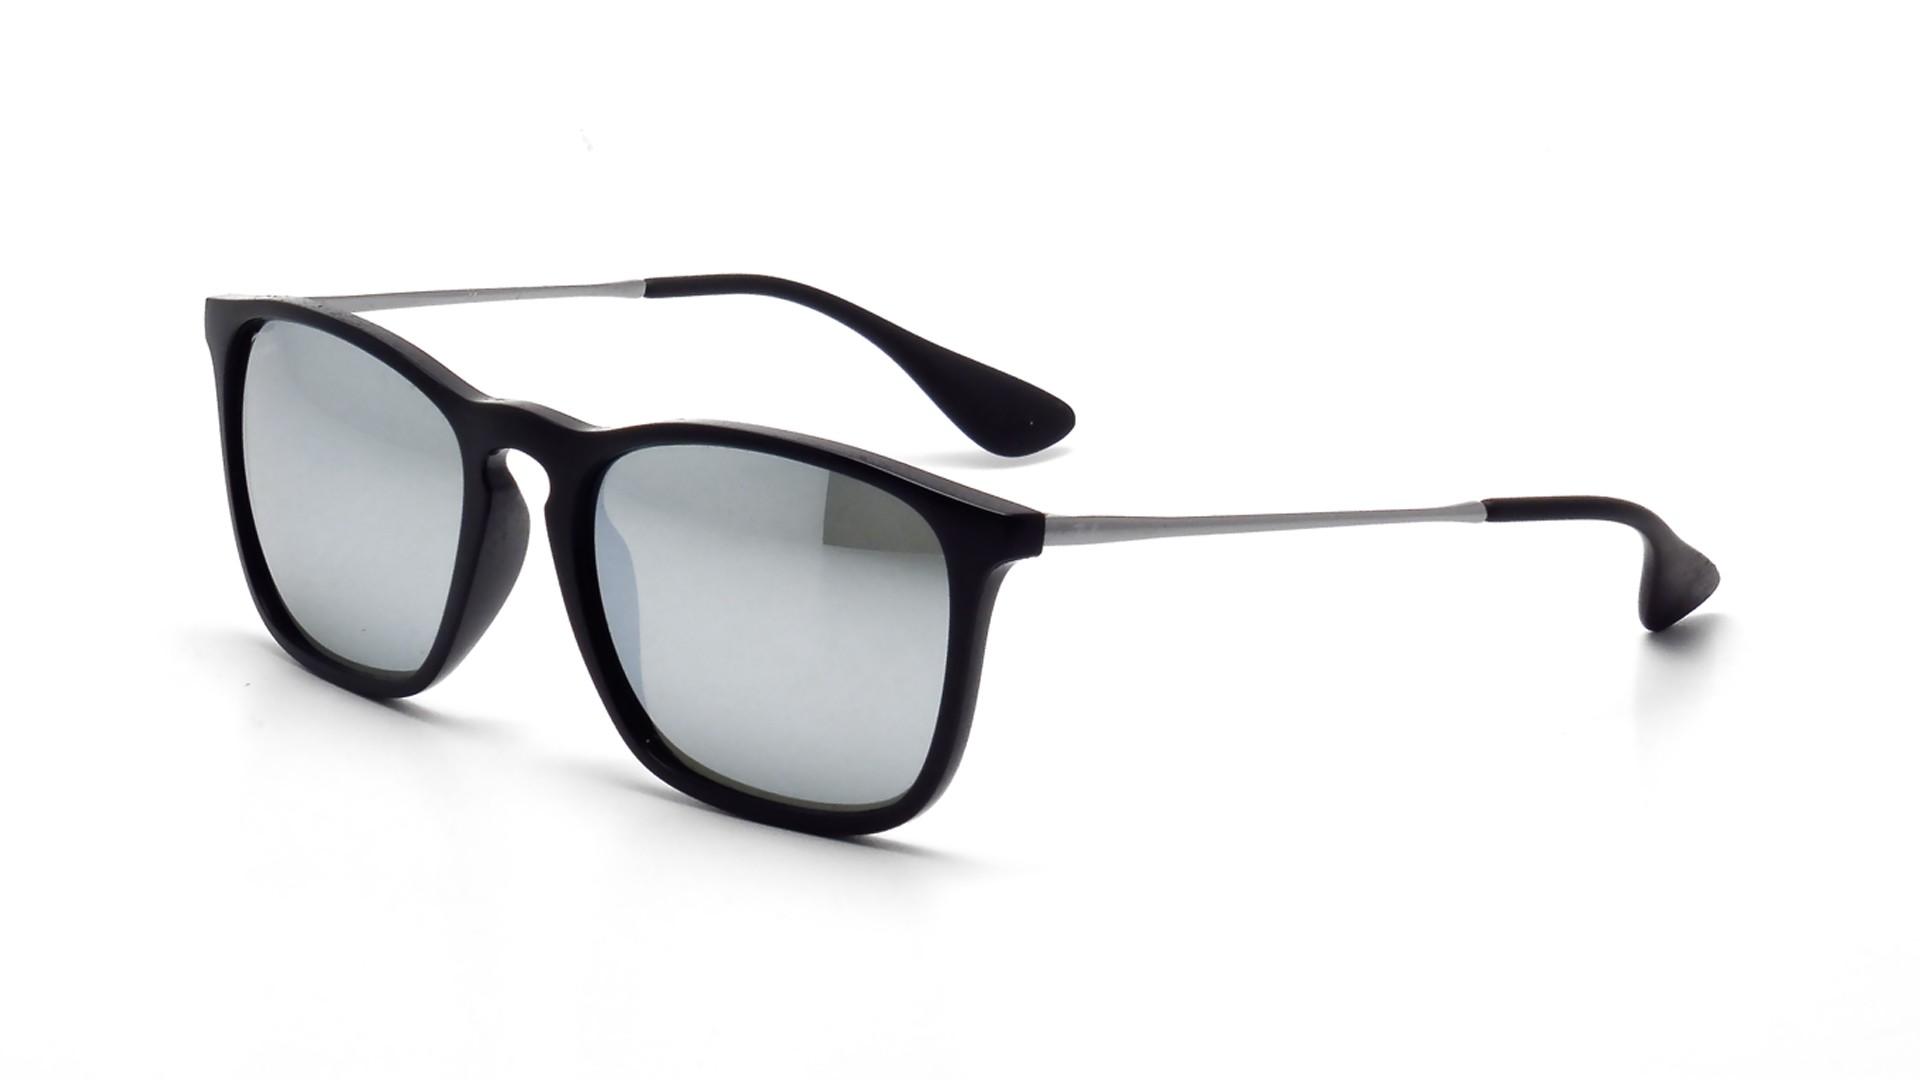 83f418279af9d Sunglasses Ray-Ban Chris Black RB4187 601 30 54-18 Medium Mirror